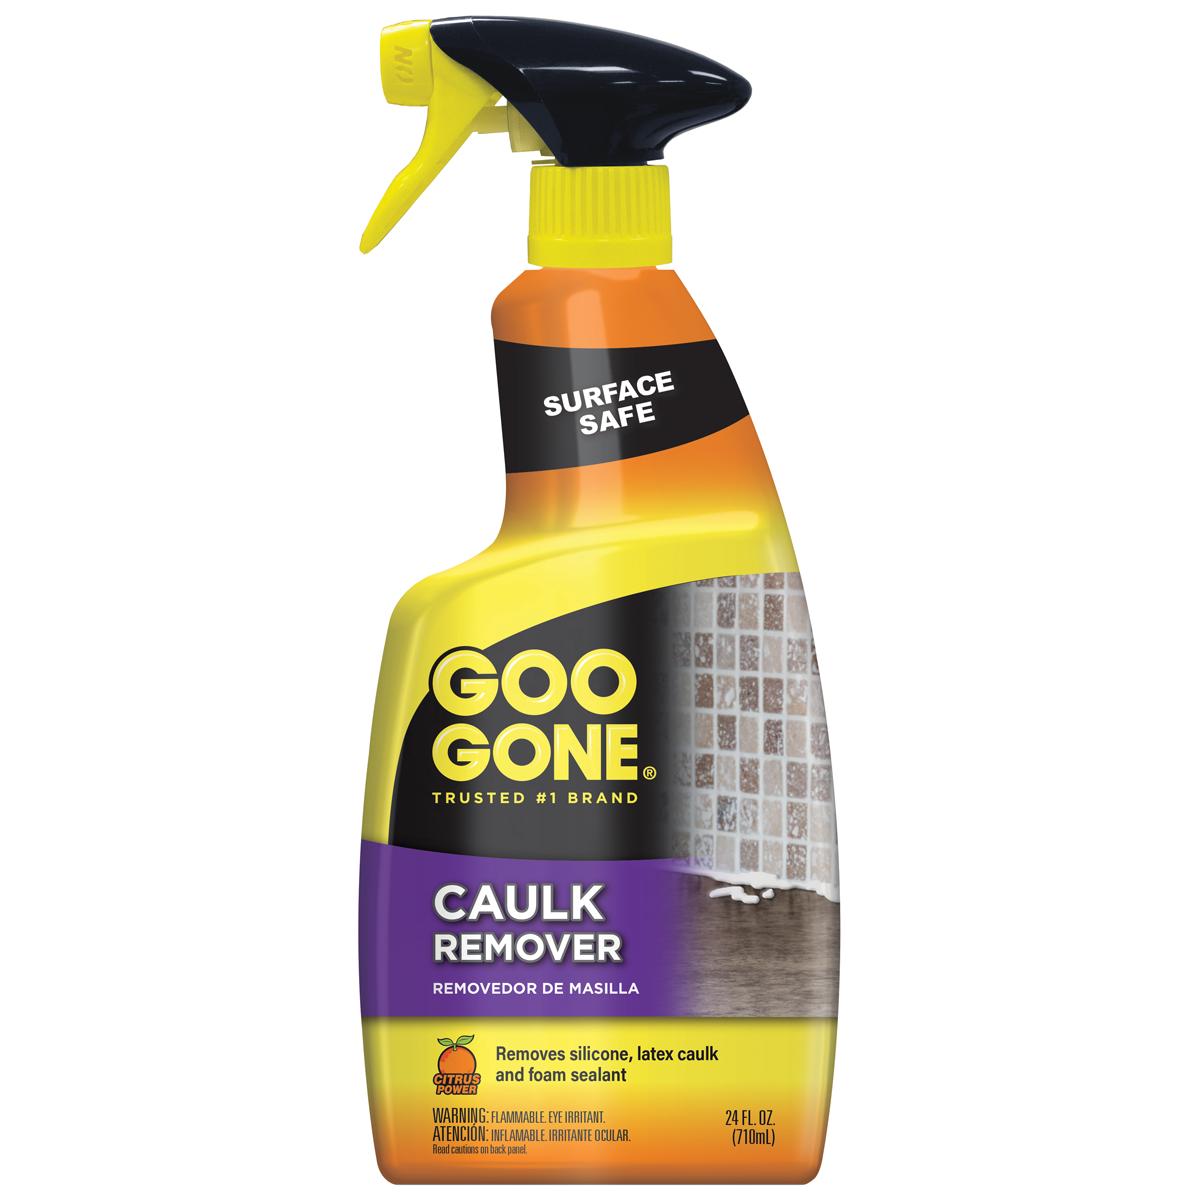 https://googone.com/media/catalog/product/g/o/goo-gone-caulk-remover_front.png